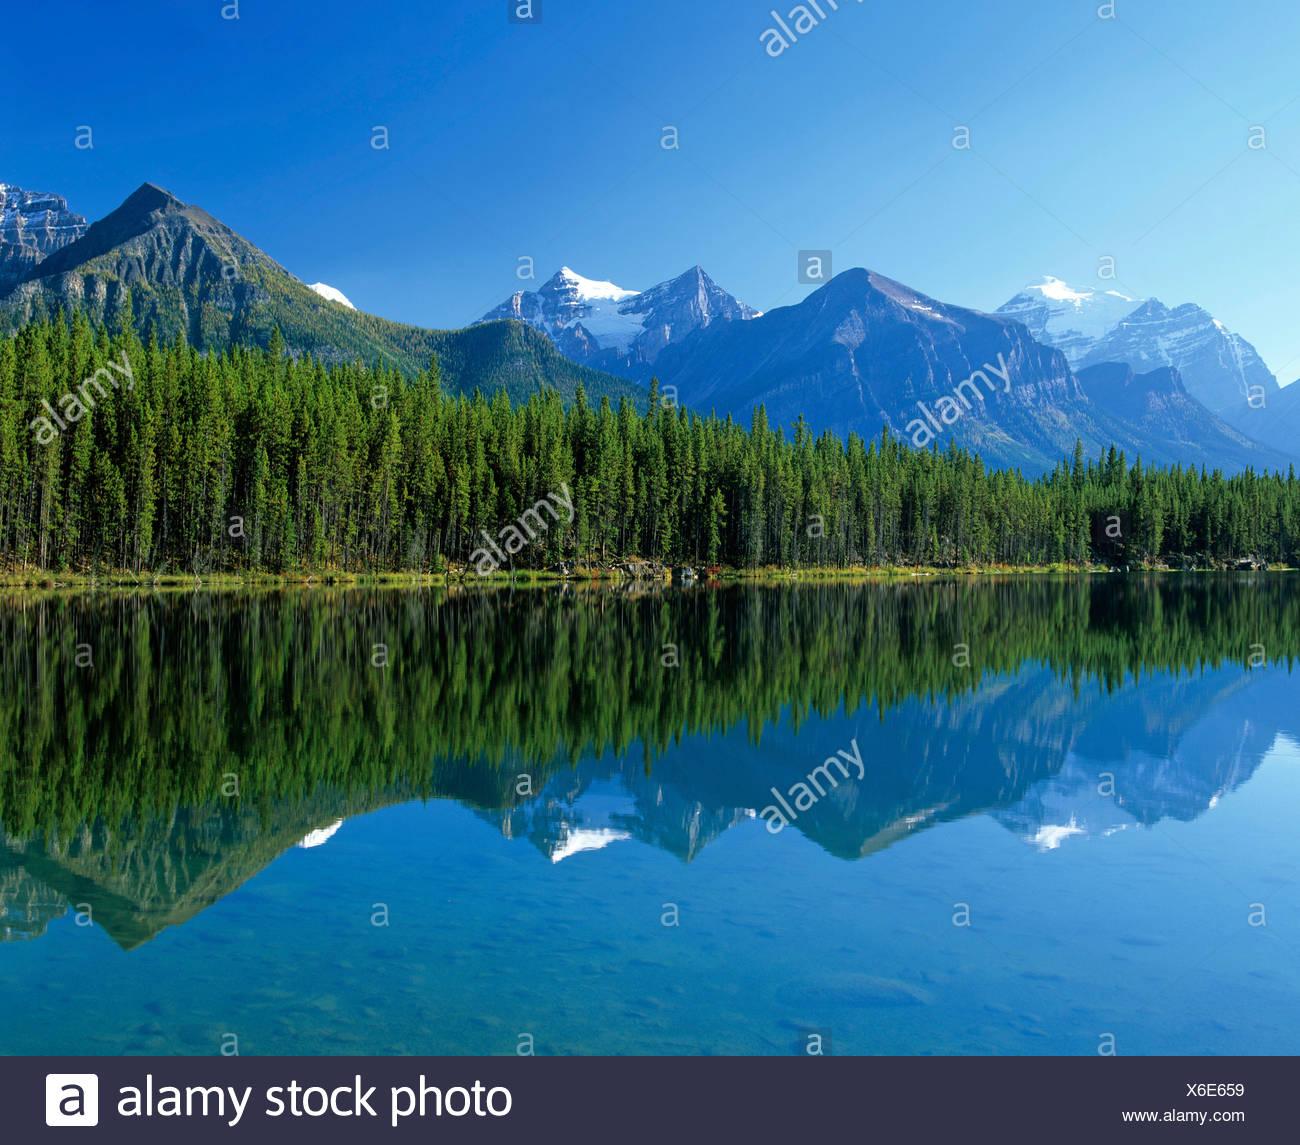 Jasper Tramway, gondola, cablecar, Alberta, Canada - Stock Image